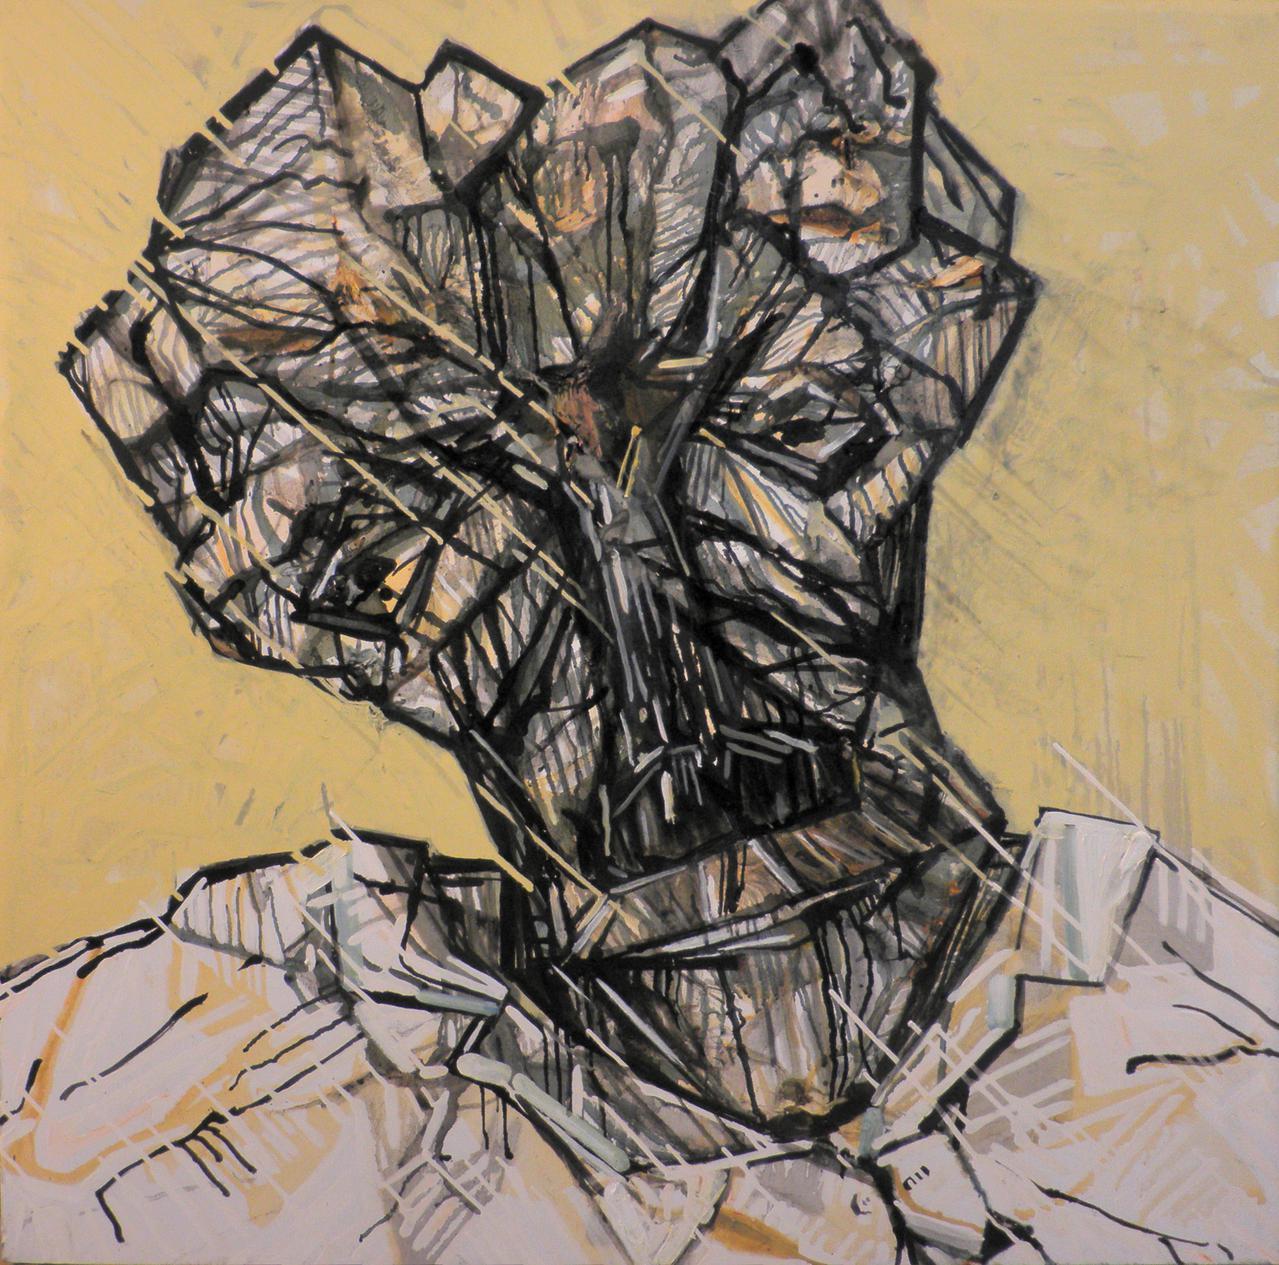 Haralabos Katsatsidis, Portrait of a patient Doctor, 1 m x 1 m, oil on canvas, 2018